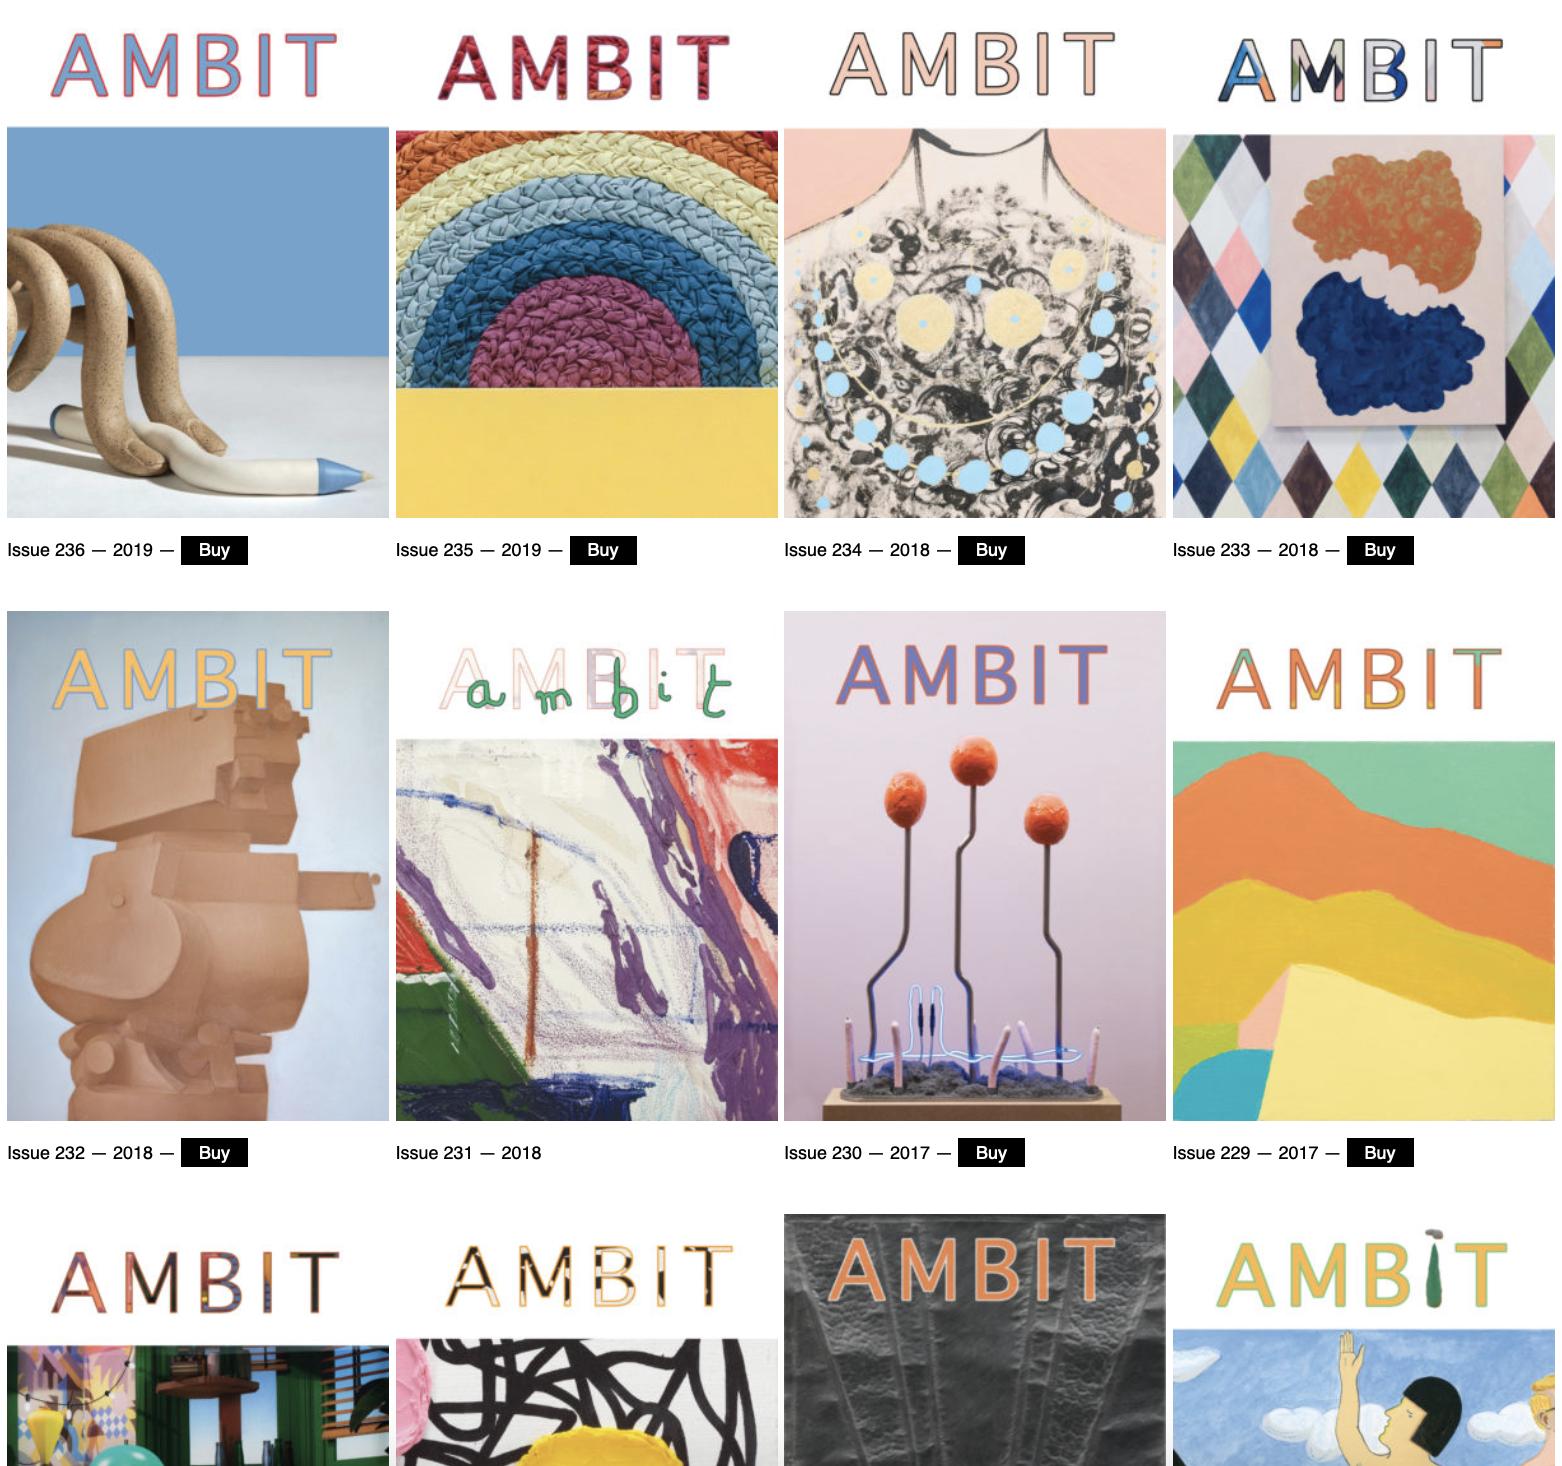 www.ambit.com